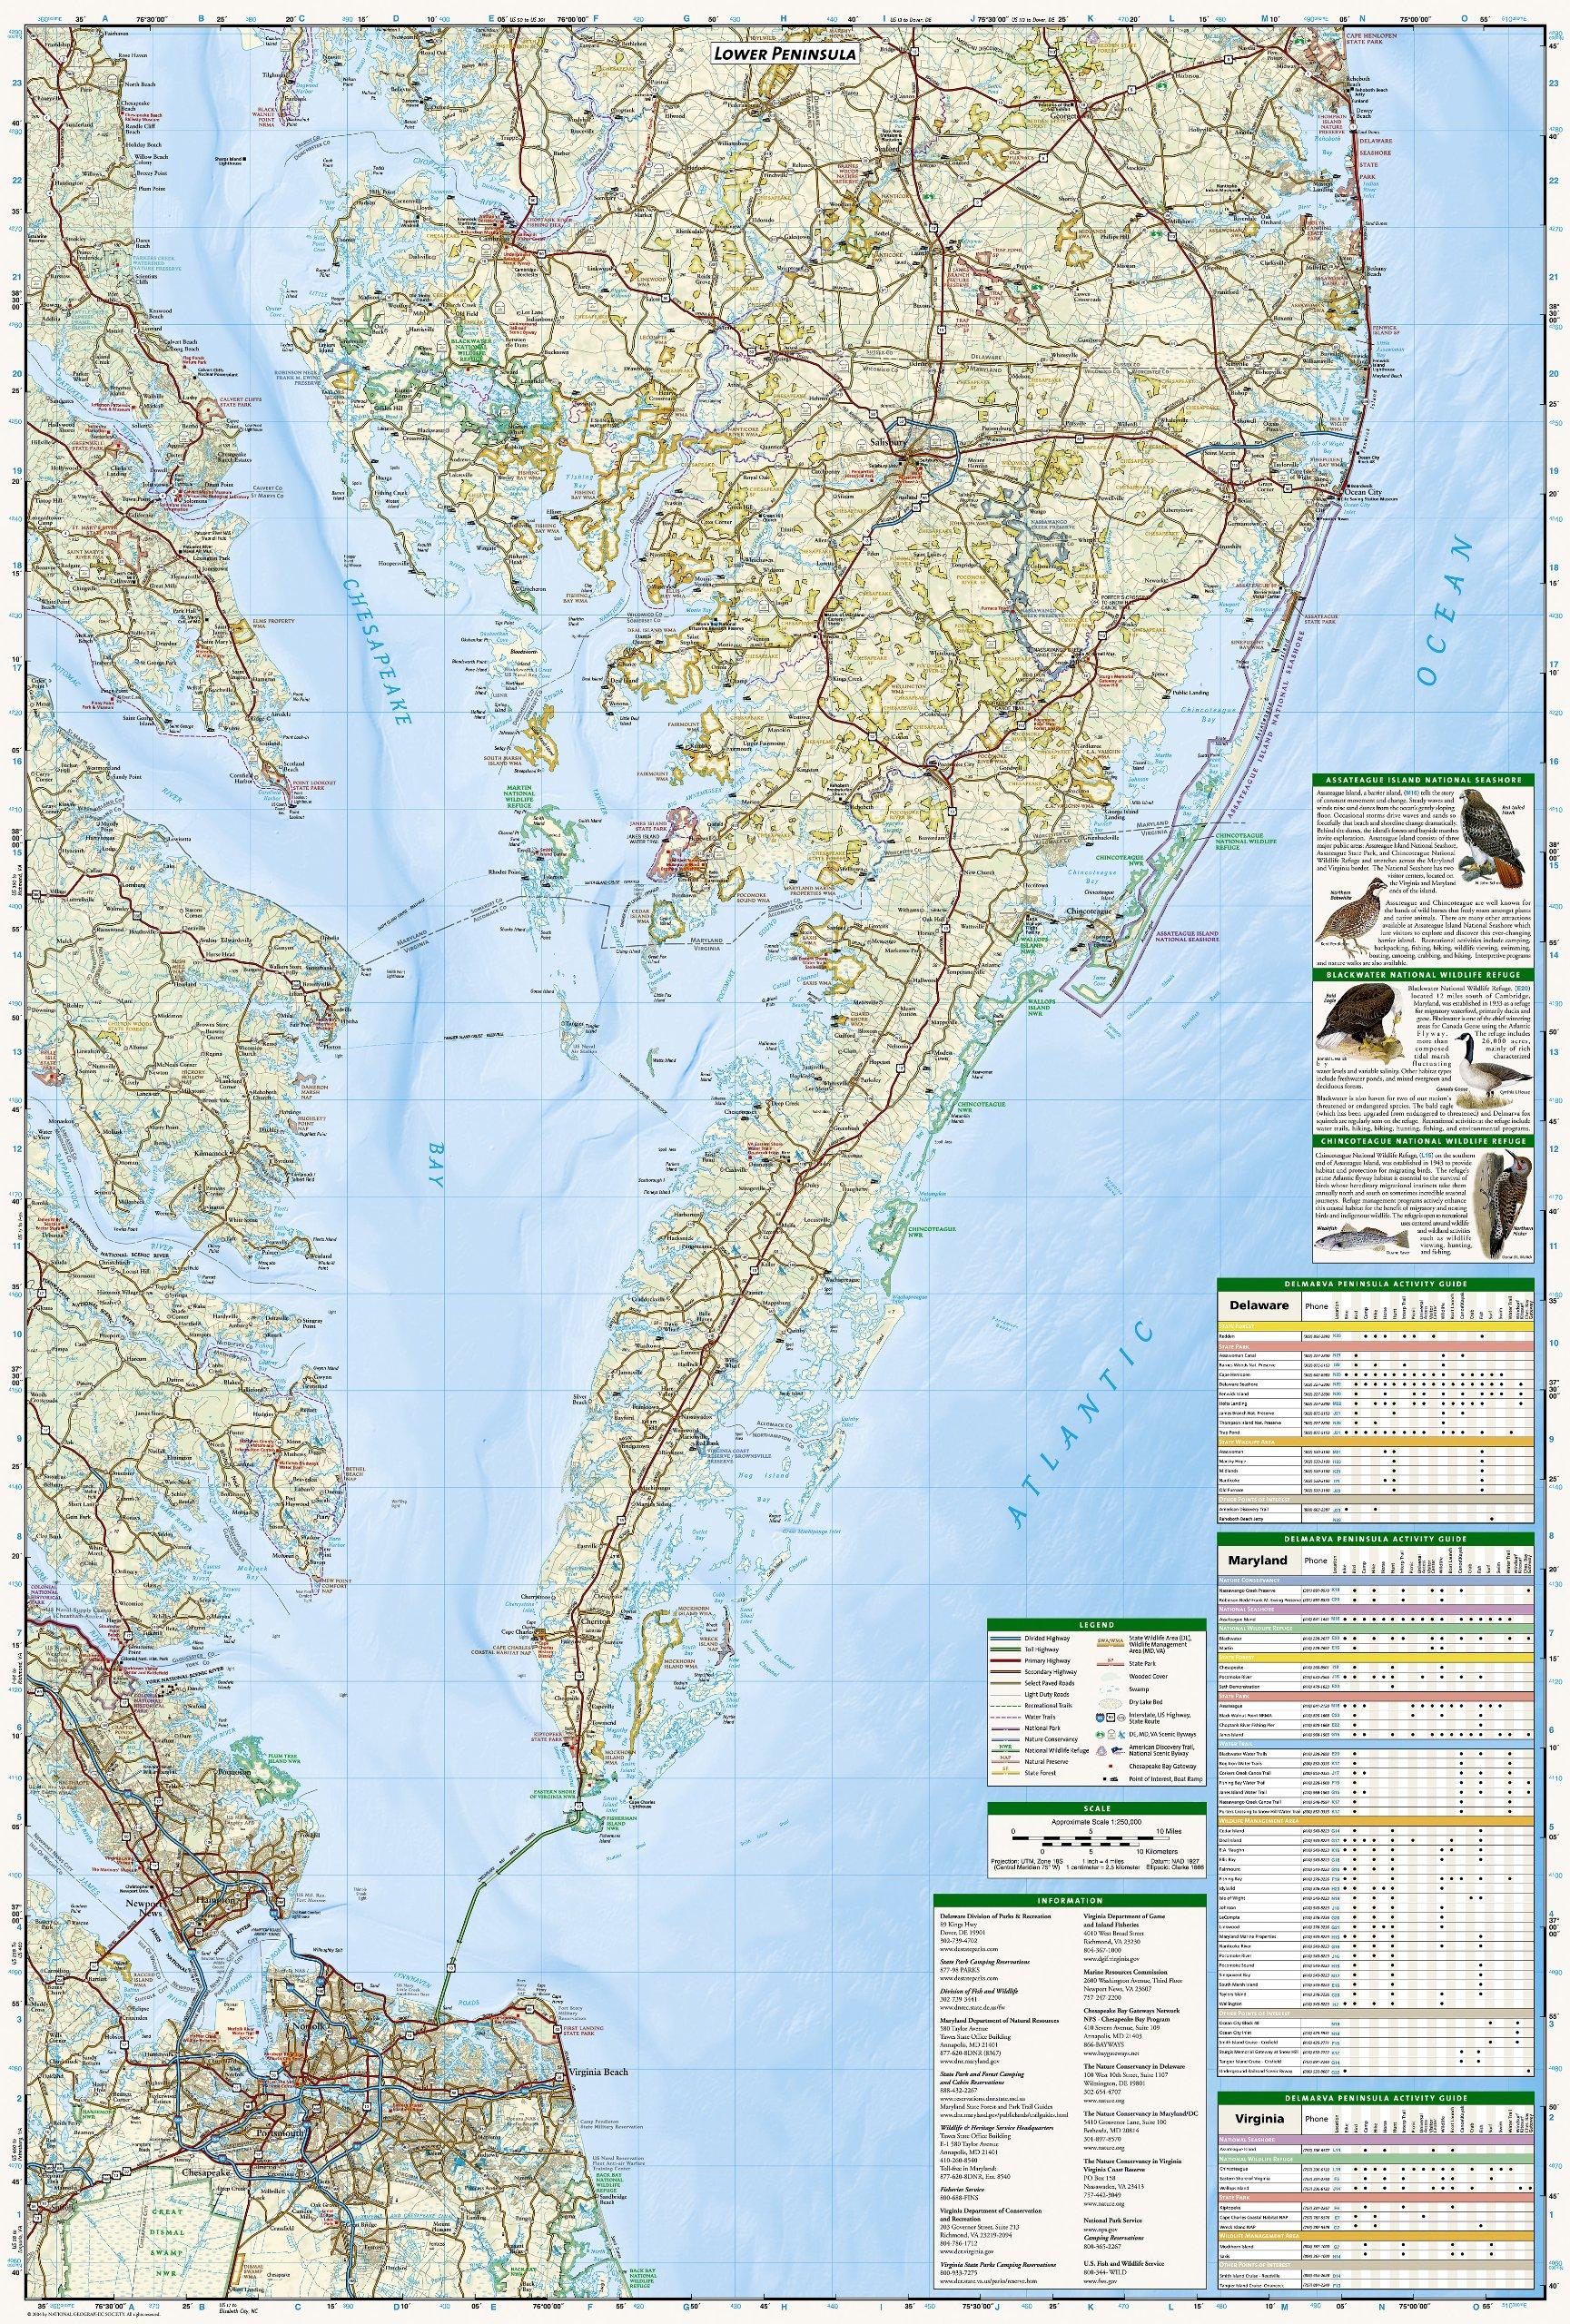 delmarva peninsula national geographic trails illustrated map